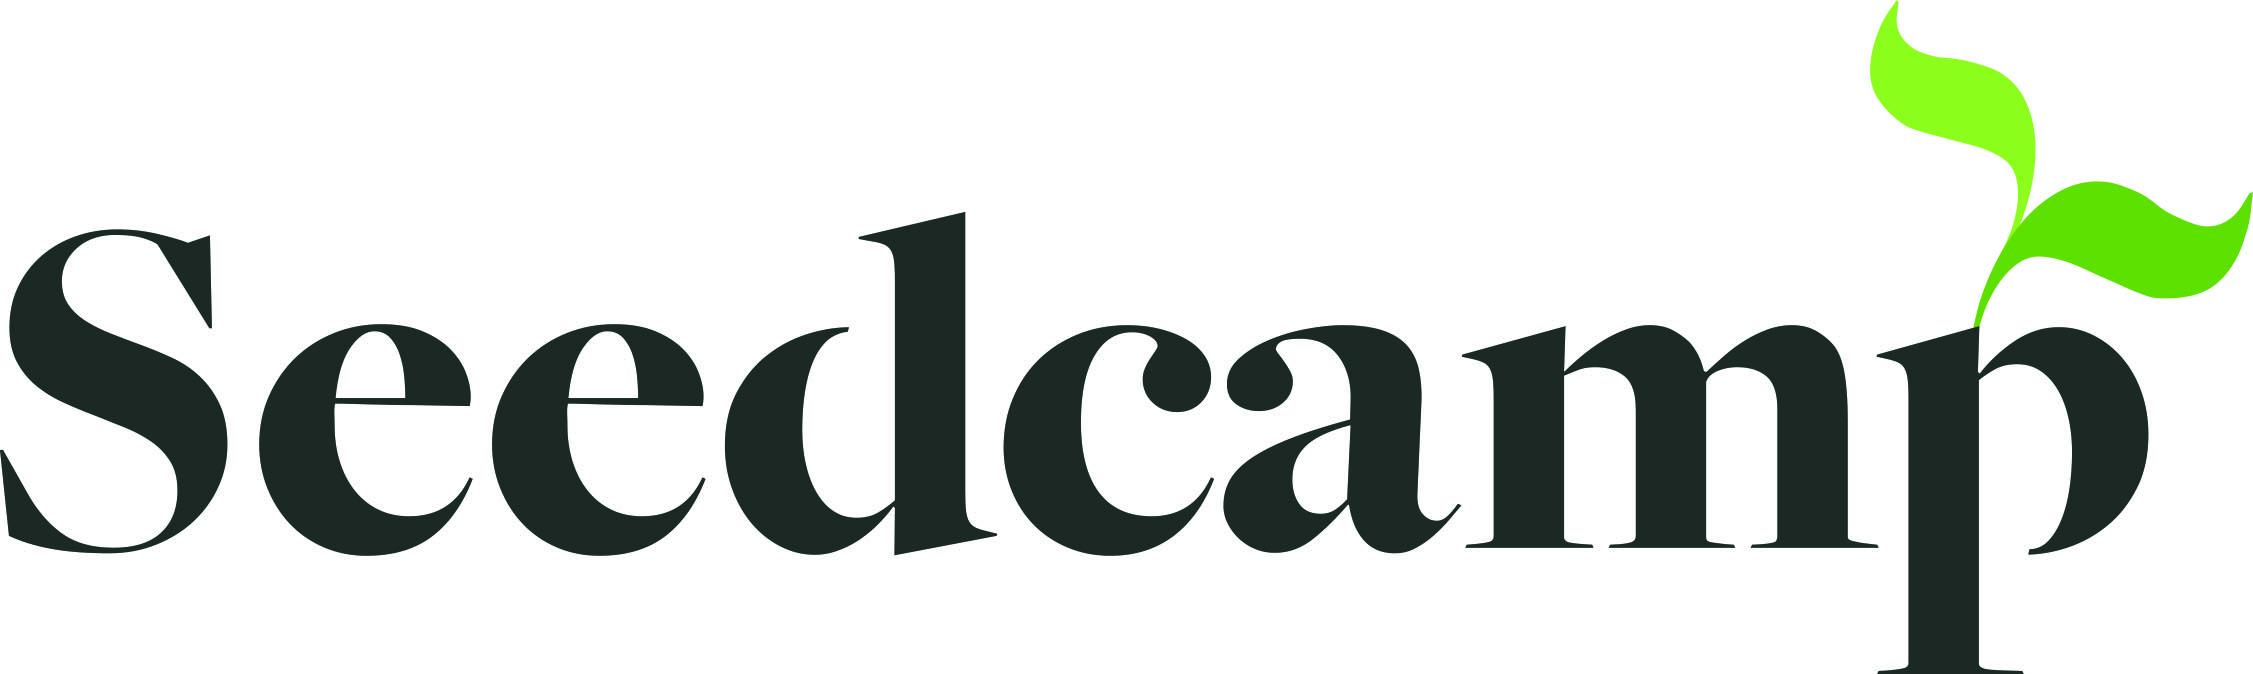 Seedcamp_Logo JPG.jpg